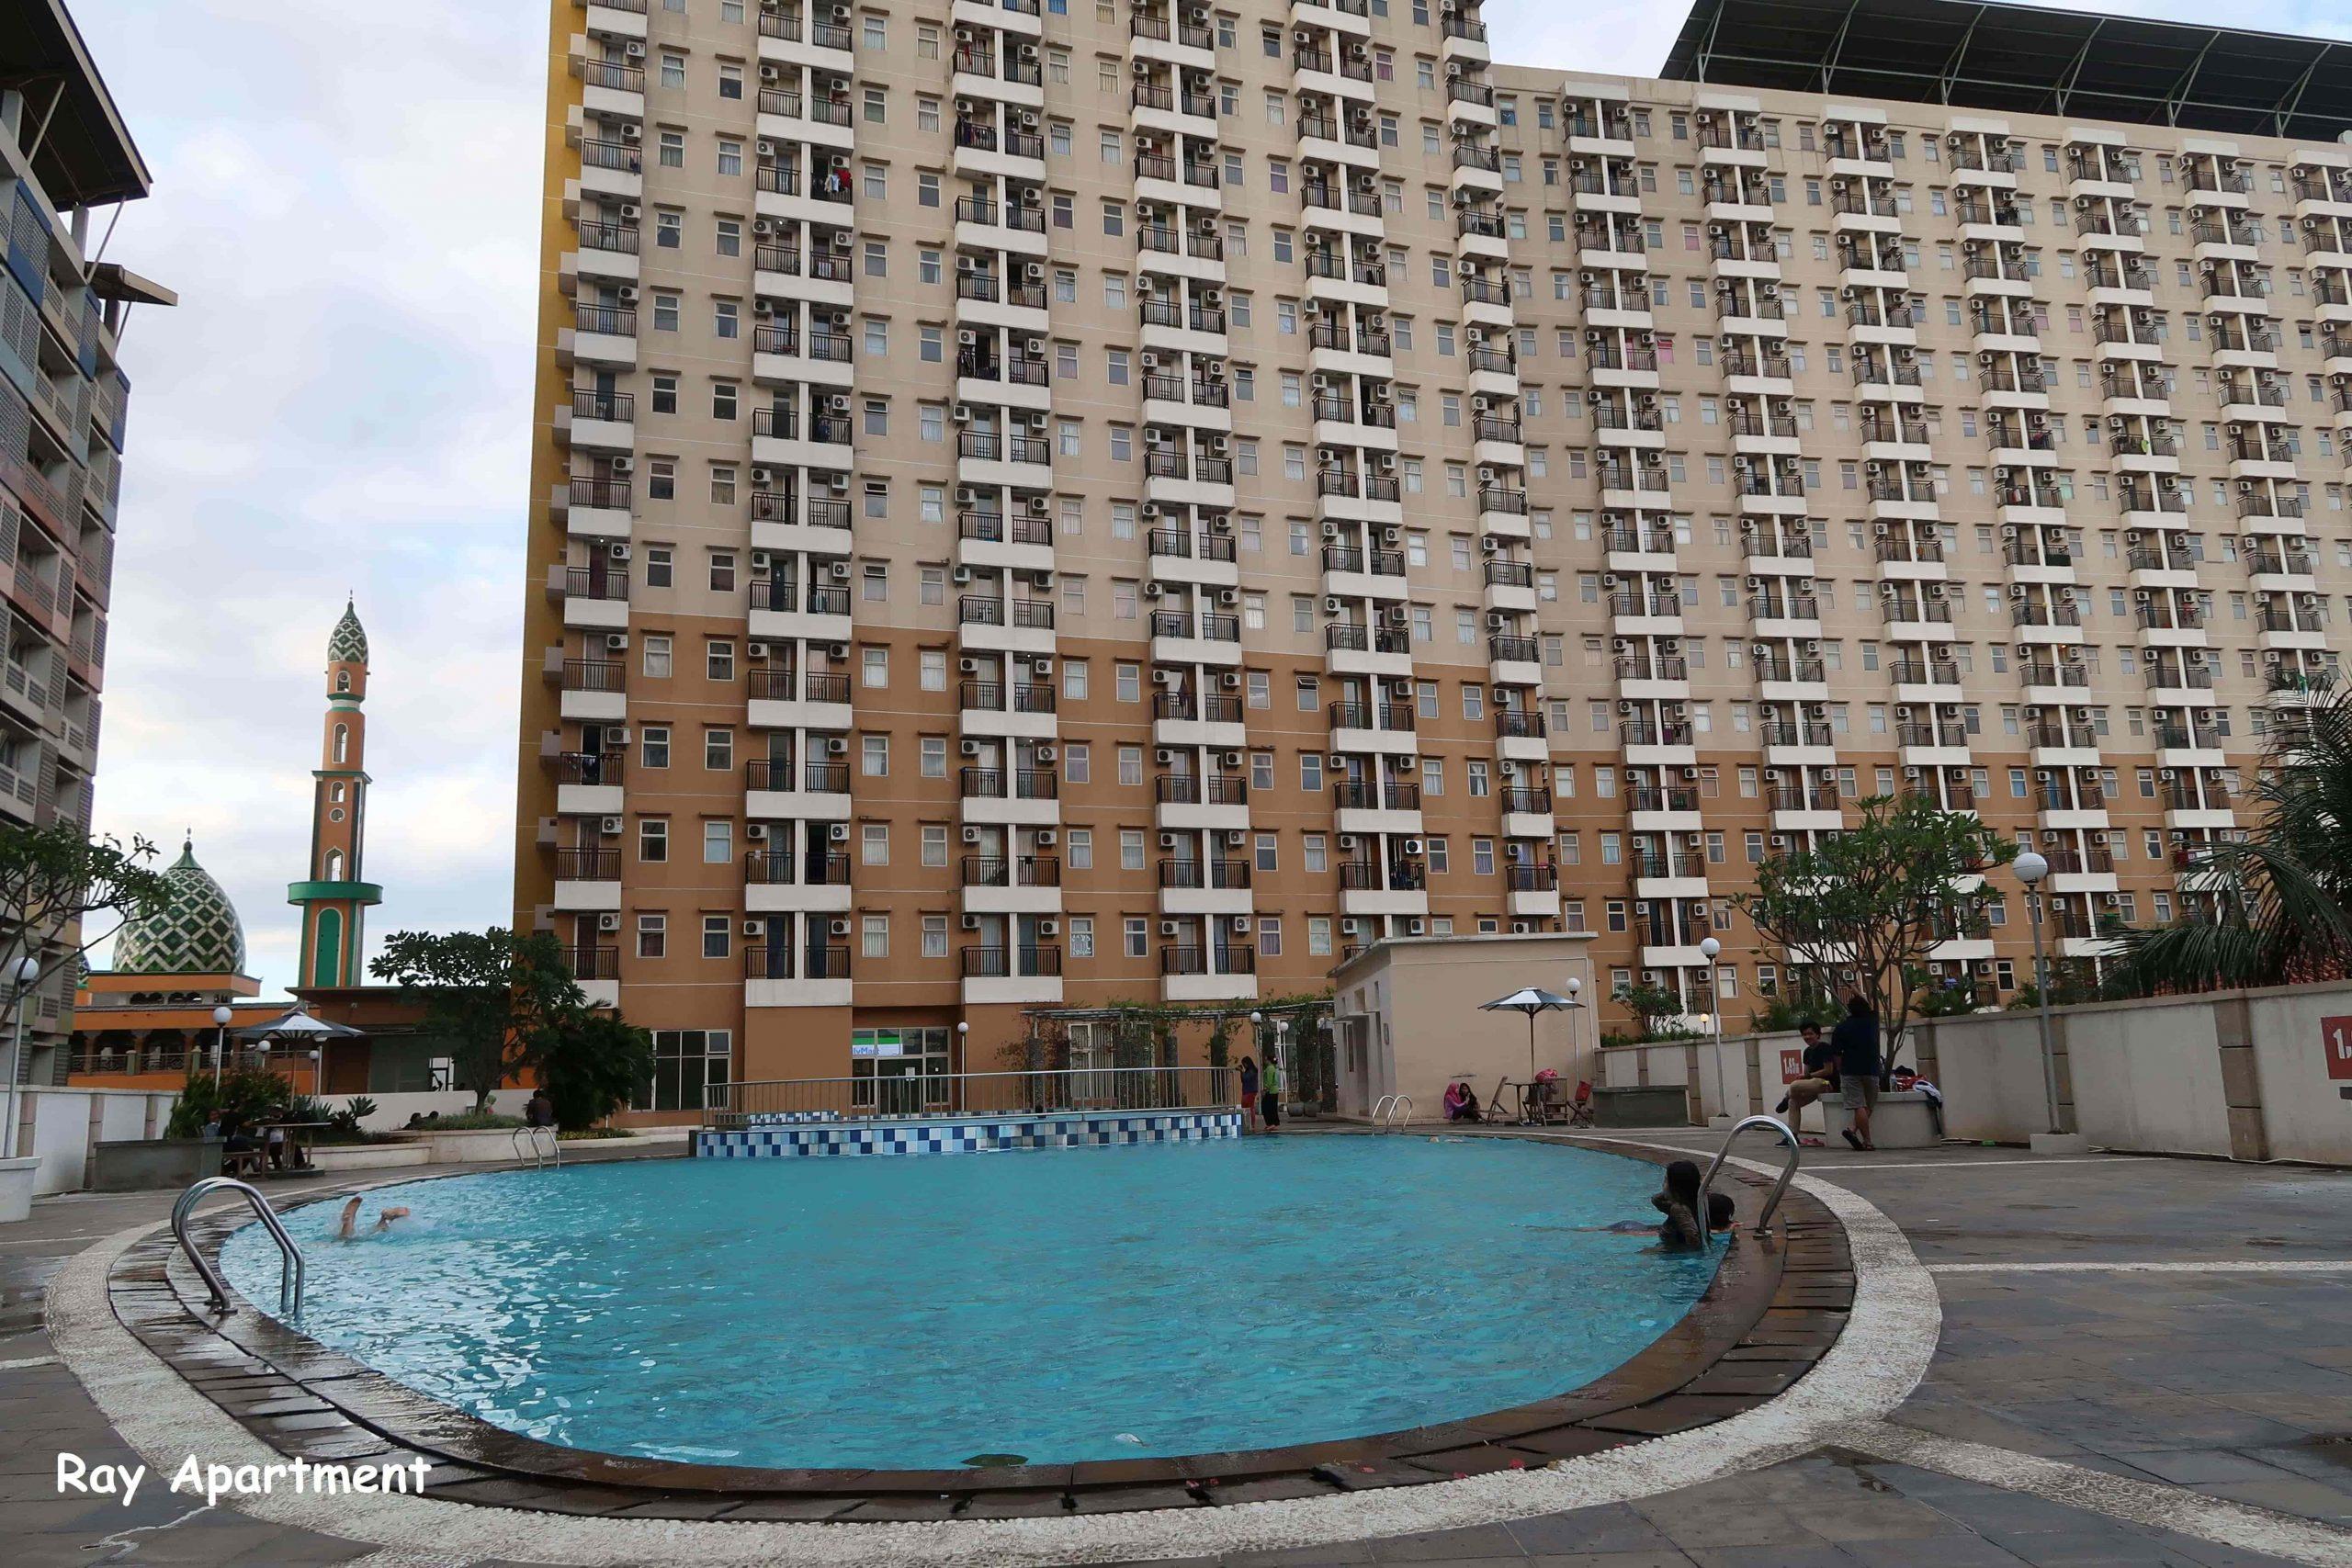 Cari Penginapan Harian Murah di Depok? Sewa Apartemen Margonda Residence 2 Saja! 1